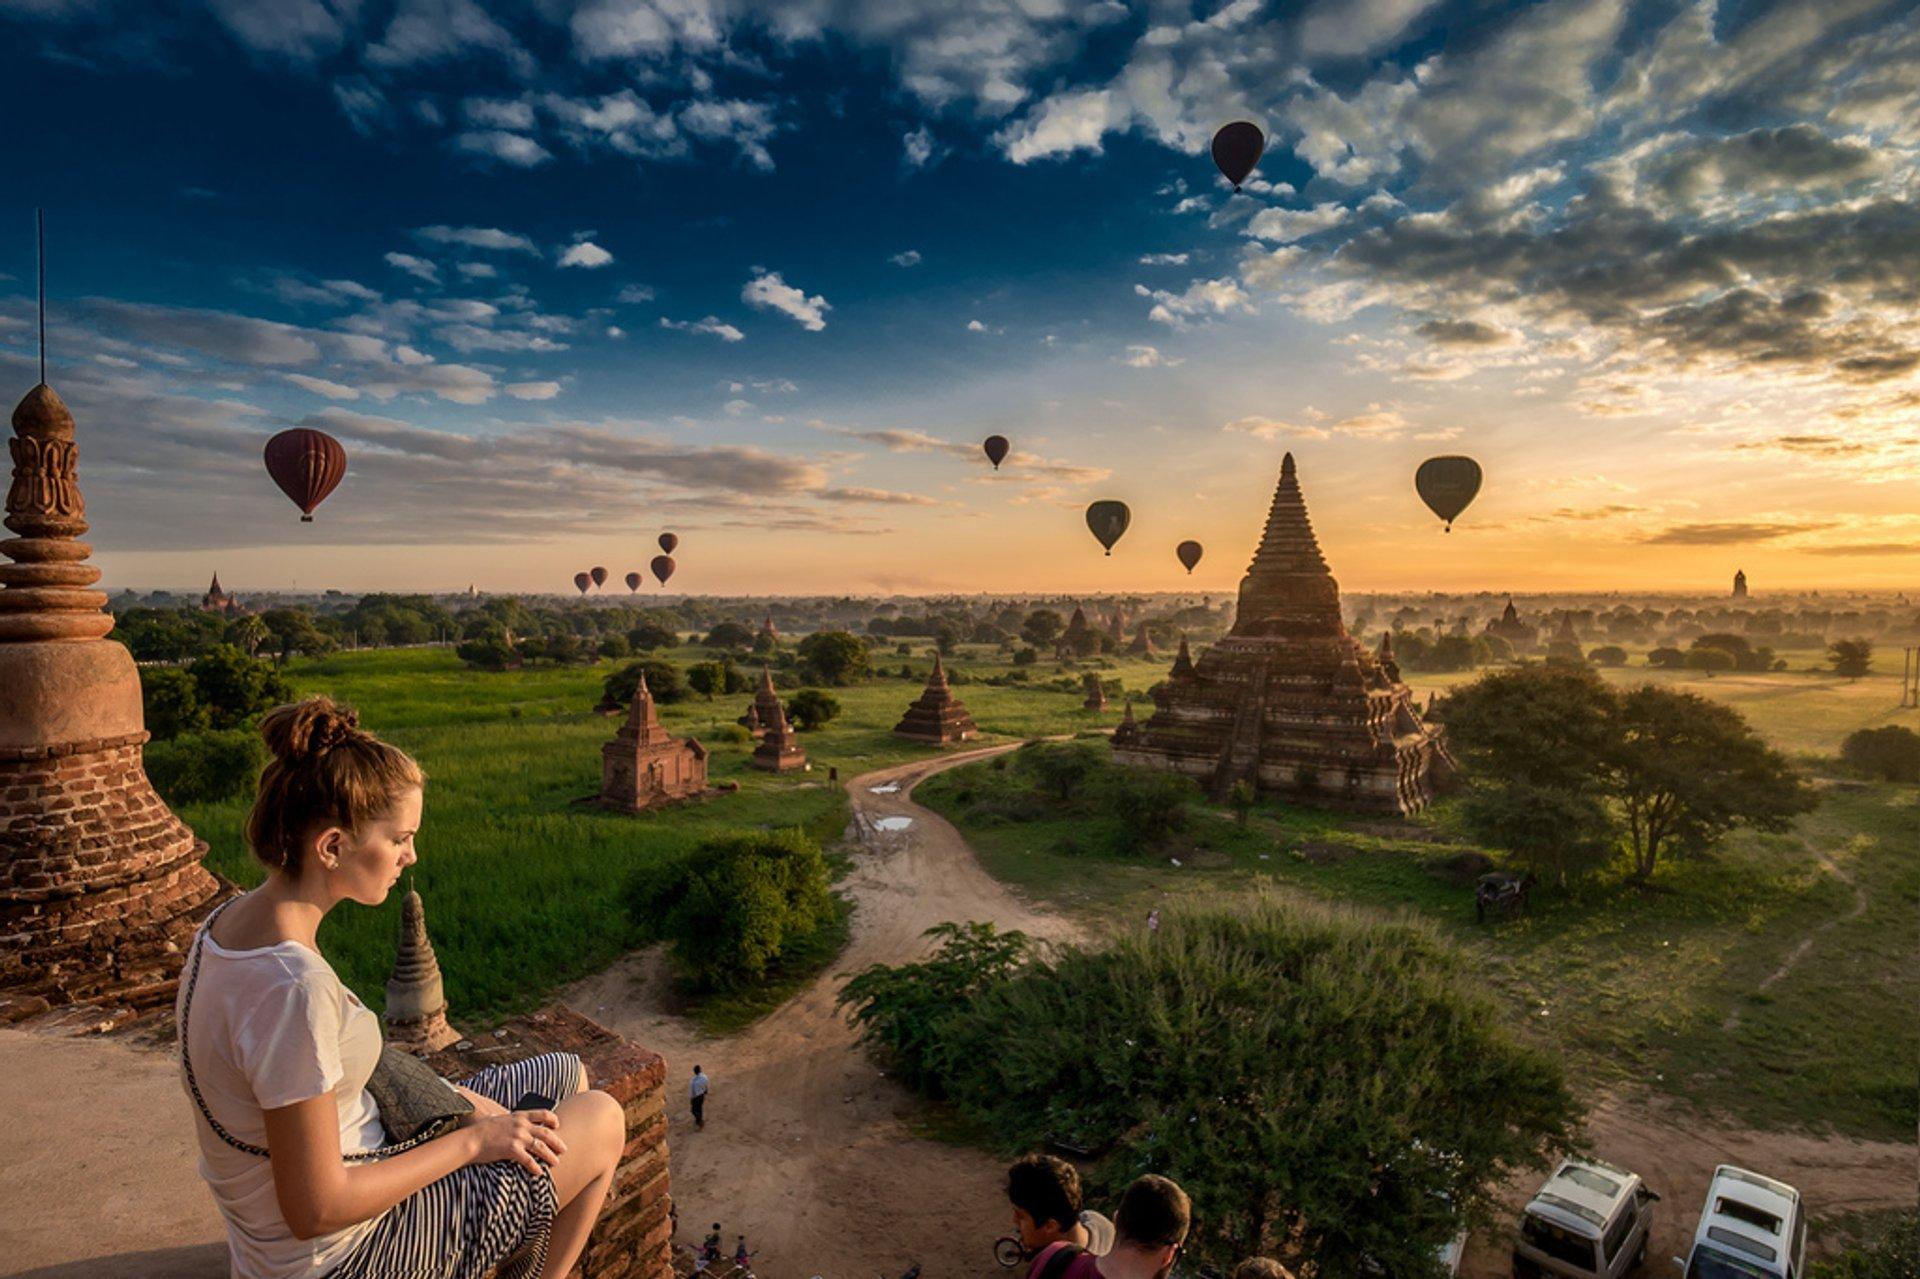 Air Ballooning over Bagan in Myanmar - Best Time